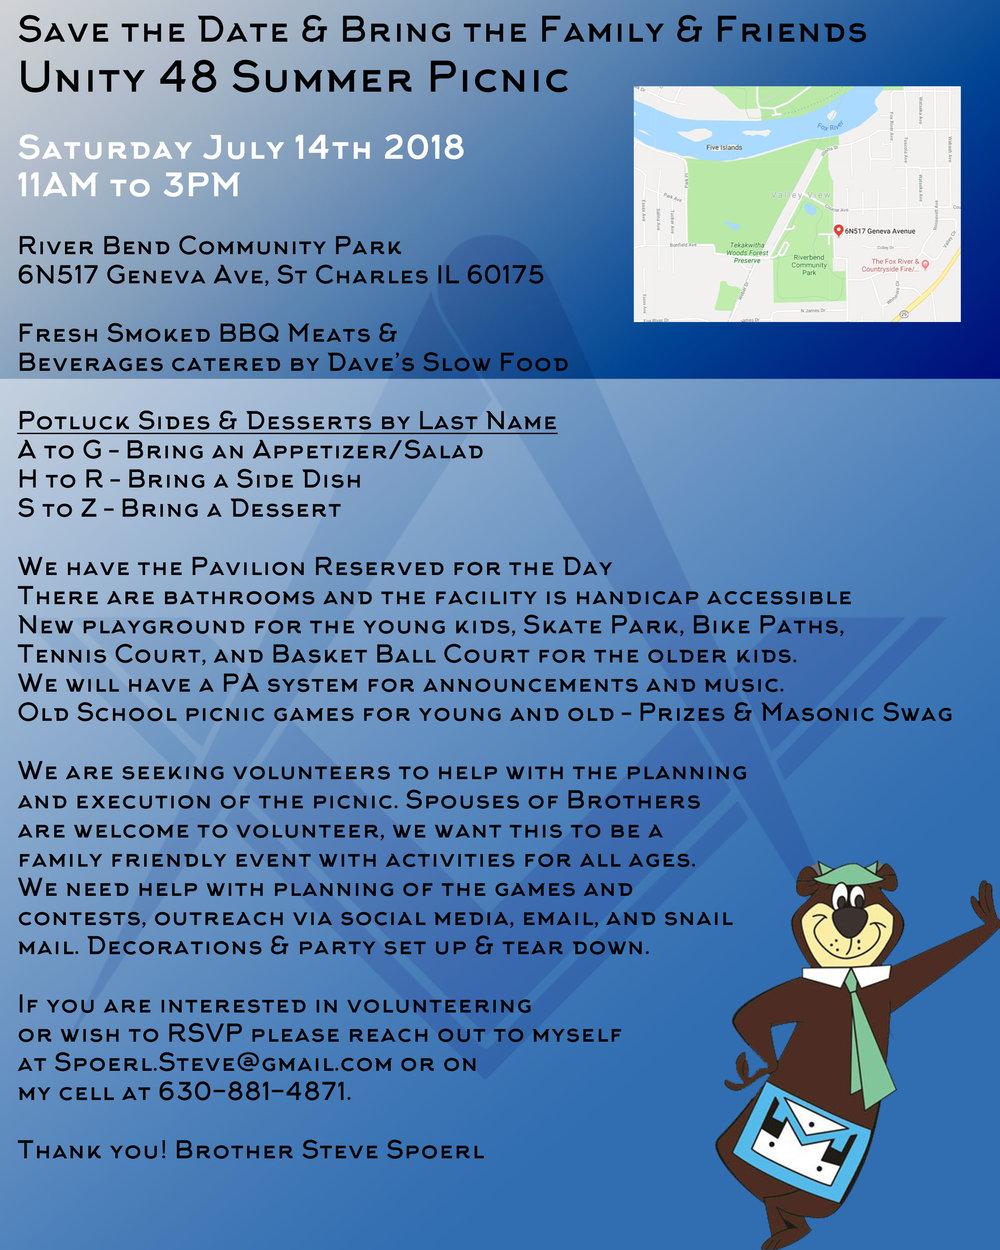 Unity 48 Summer Picnic !! 7/14/2018 — Unity Lodge #48